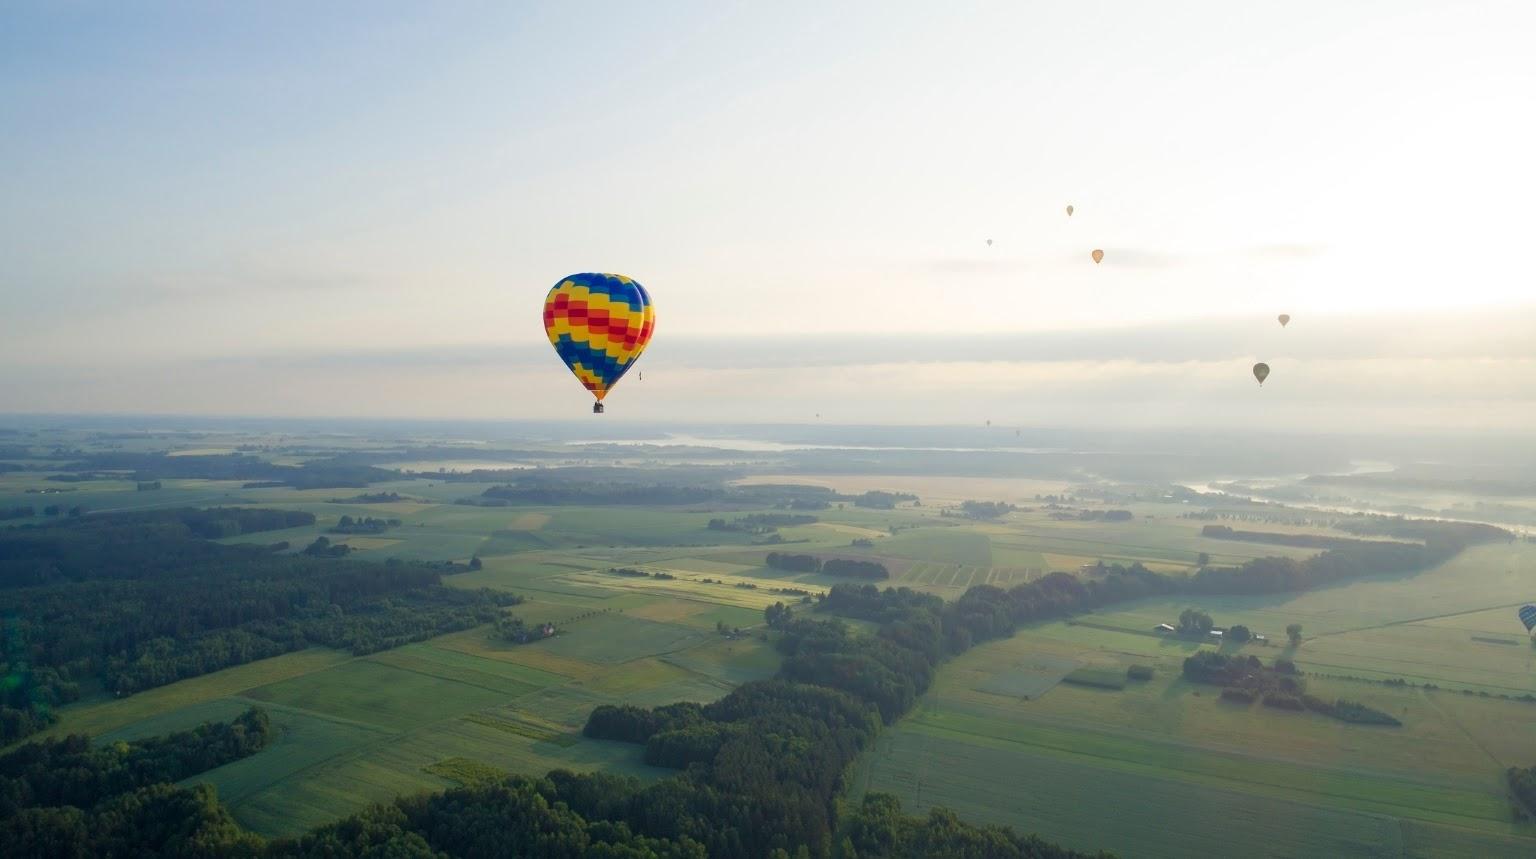 Lithuanians love hot air balloons